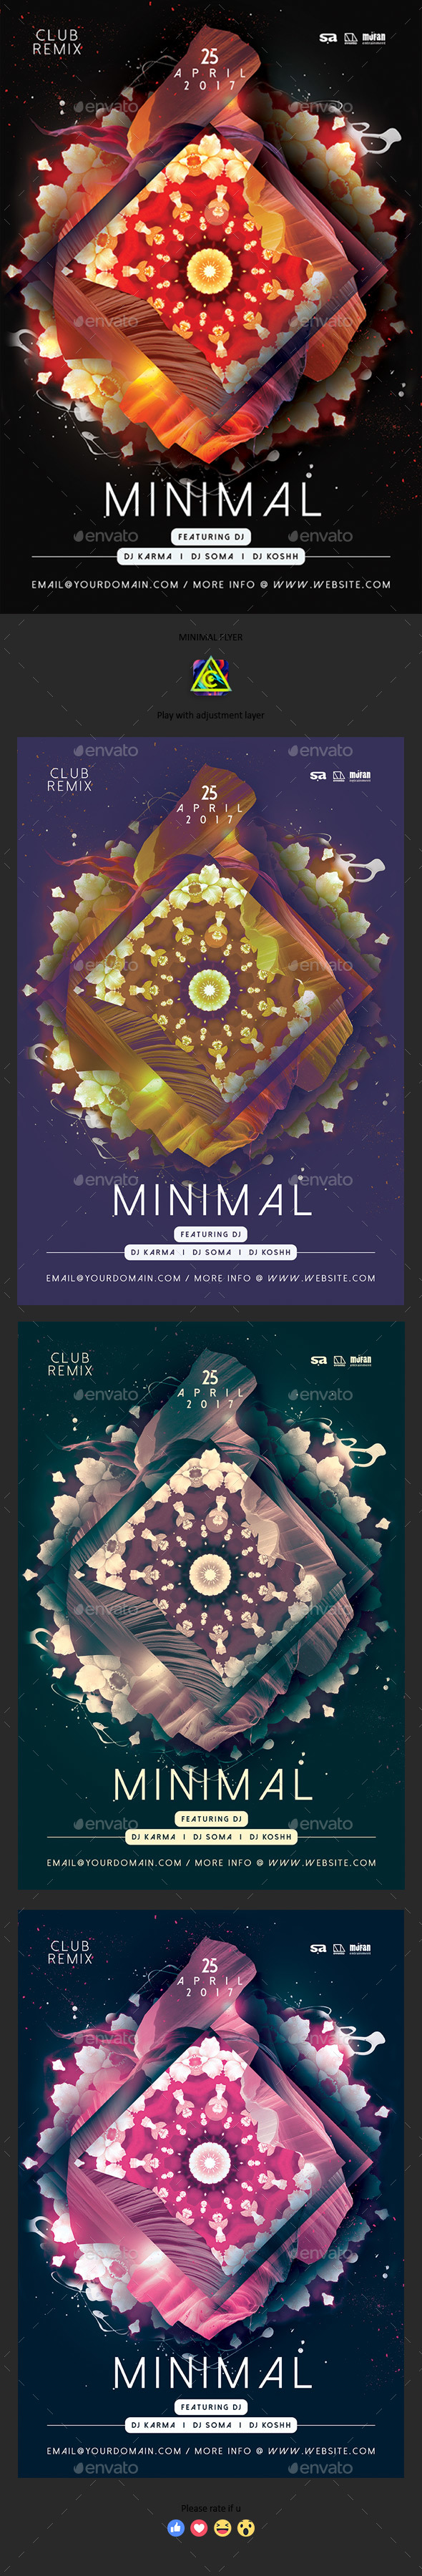 GraphicRiver Minimal Flyer 20425255